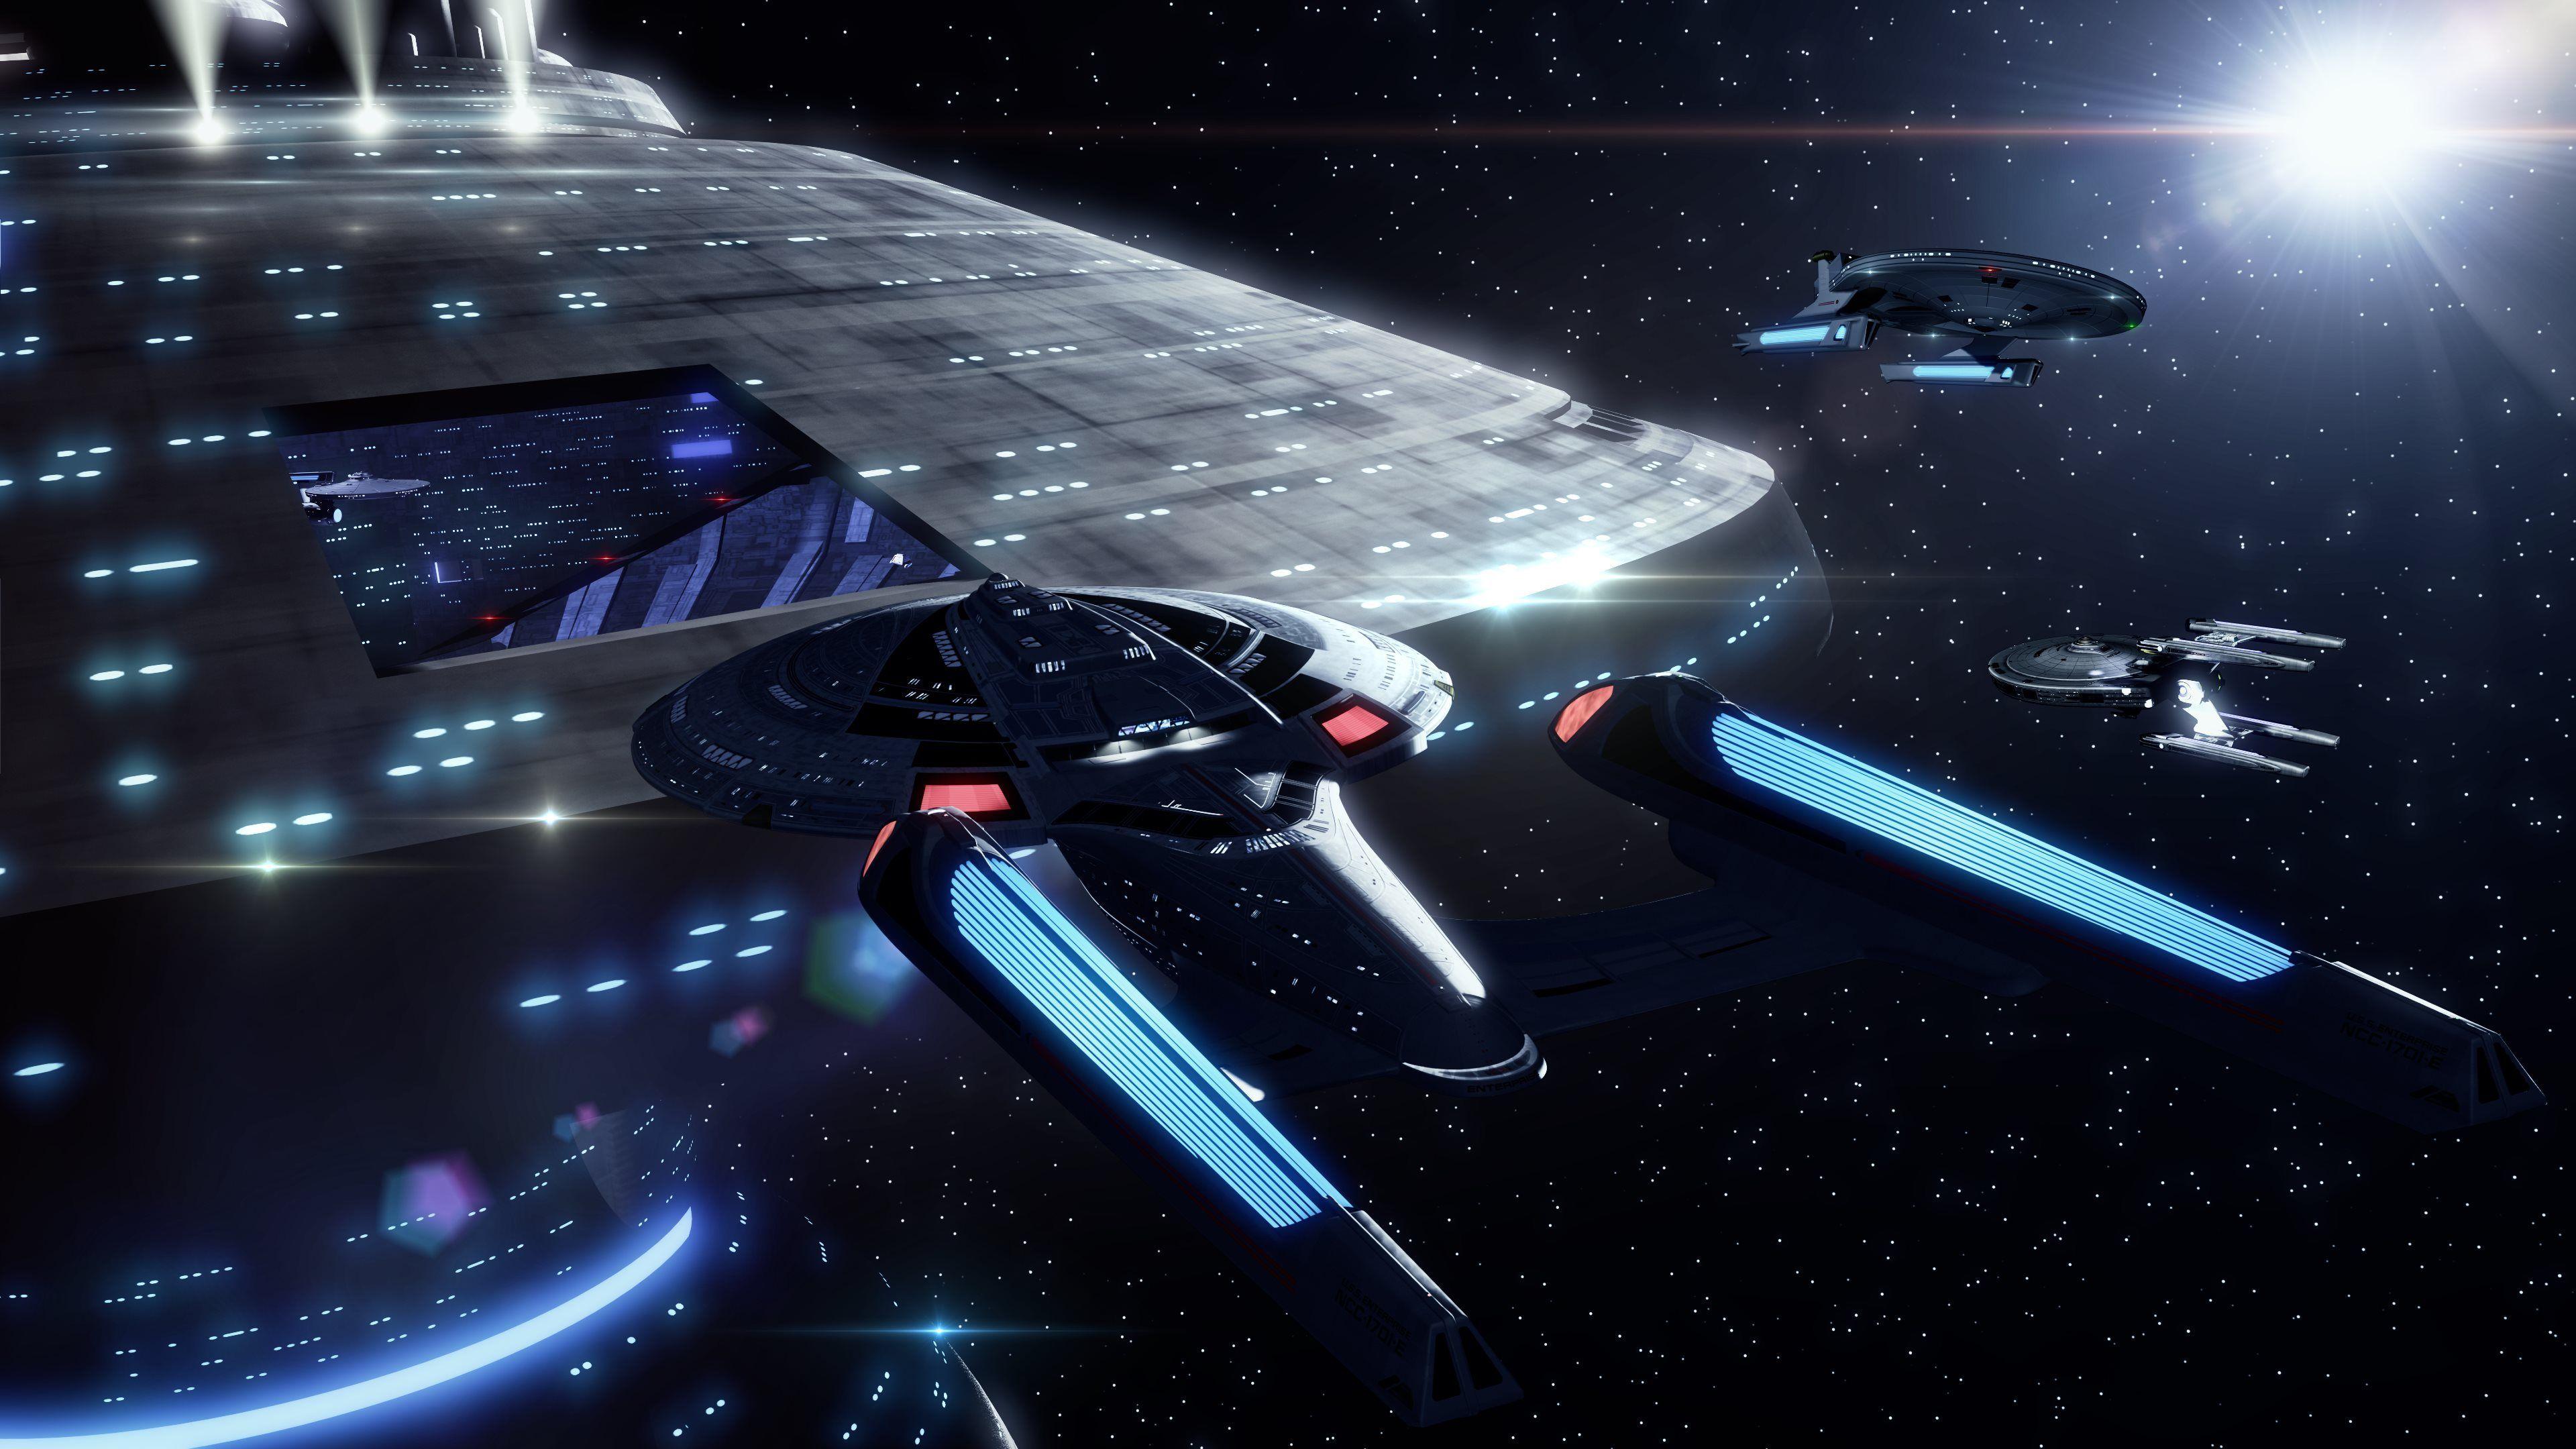 Star Trek Wallpaper 4k 2092019 Hd Wallpaper